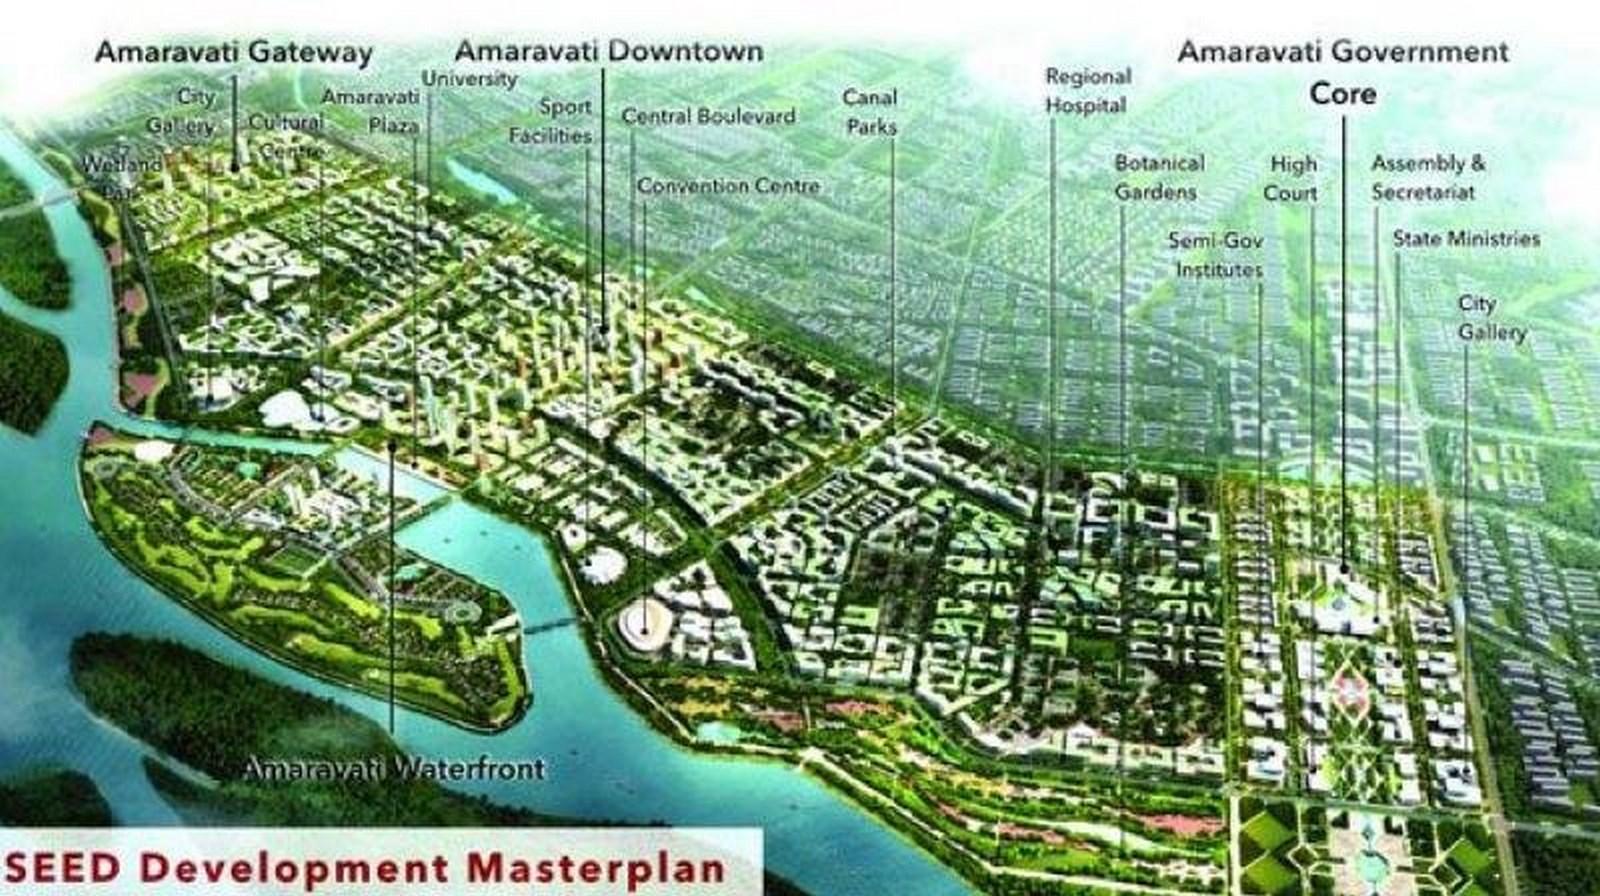 Amaravati, Andhra Pradesh - Sheet1